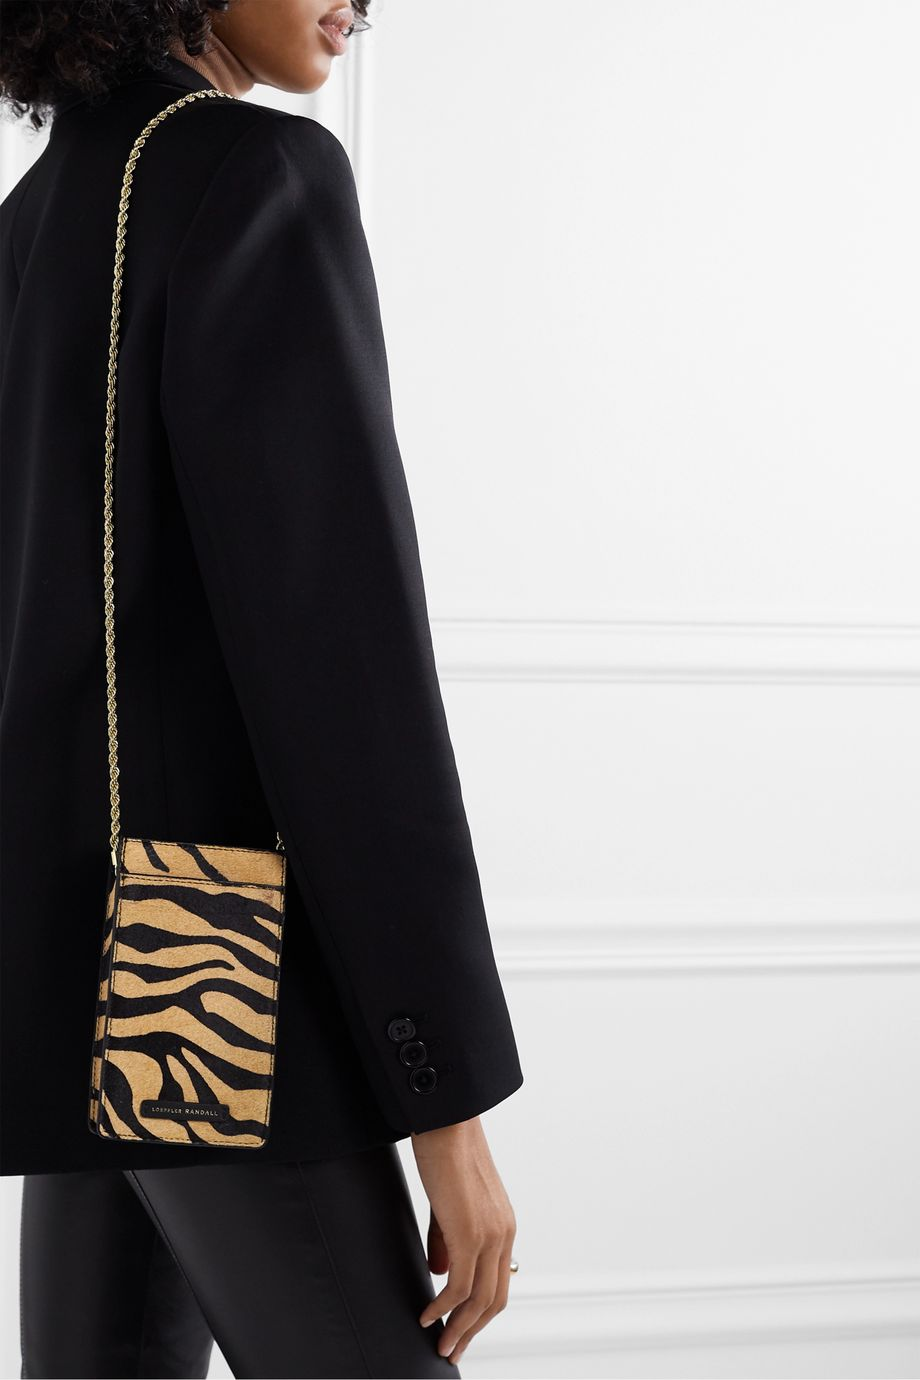 Loeffler Randall Augusta tiger-print calf hair shoulder bag